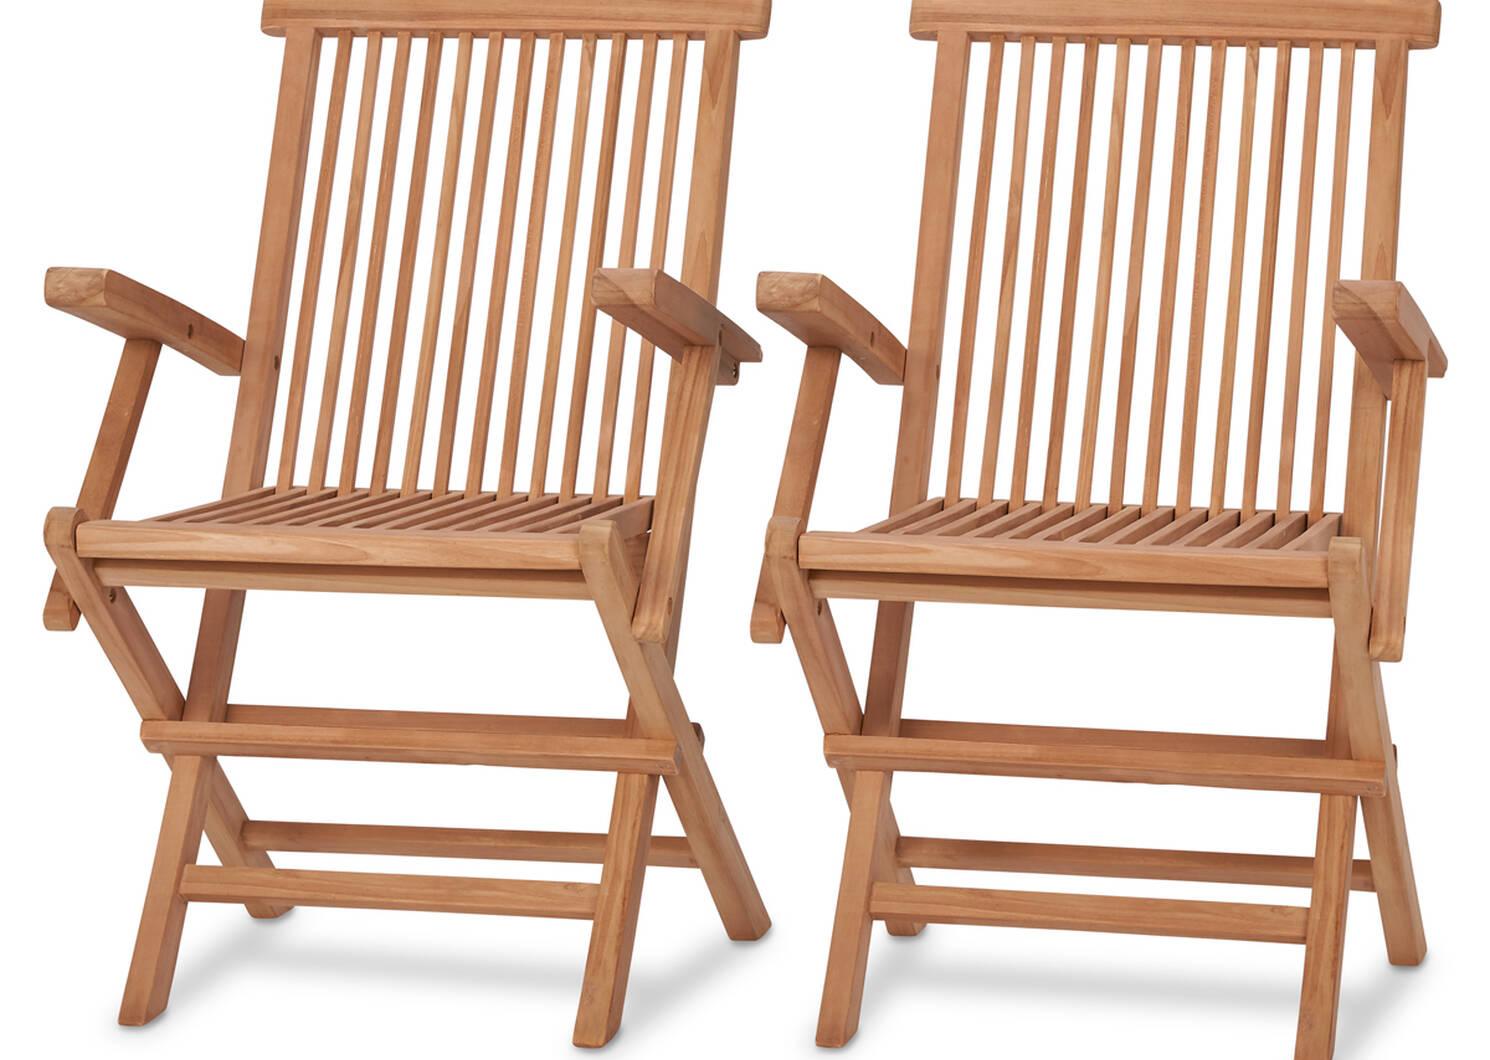 Galiano Arm Chairs S/2 -Teak Natural